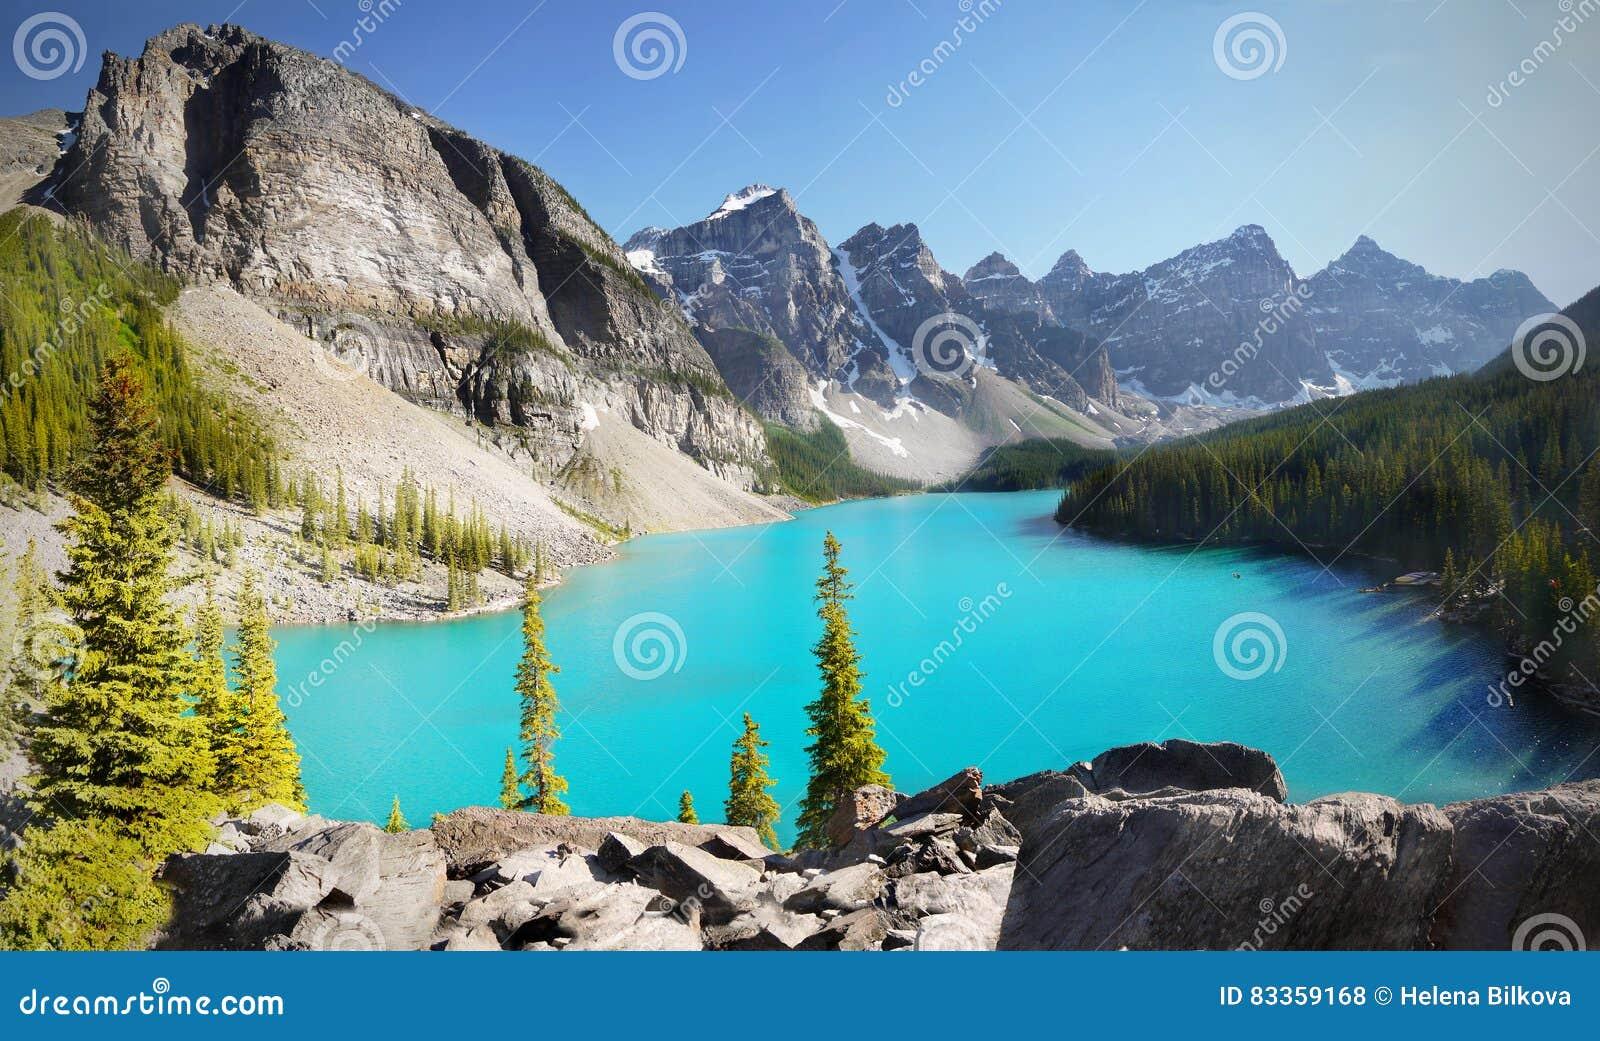 Canada, Mountains Landscape, Moraine Lake